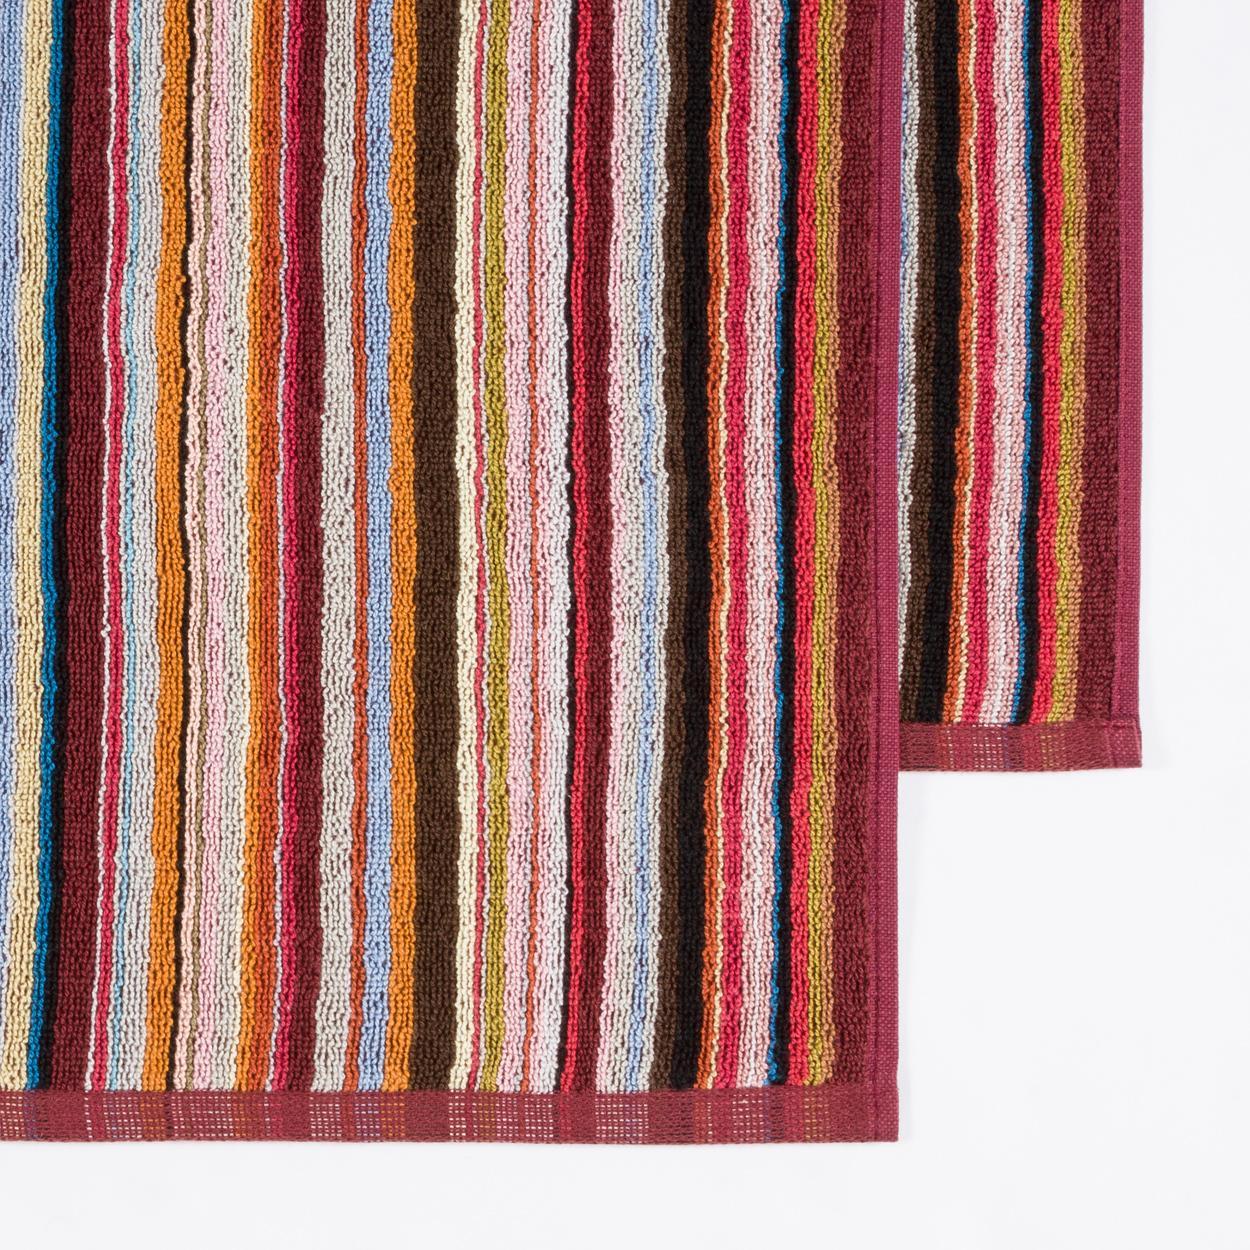 Ralph Lauren Mens Beach Towel: Paul Smith Signature Stripe Beach Towel In Multicolor For